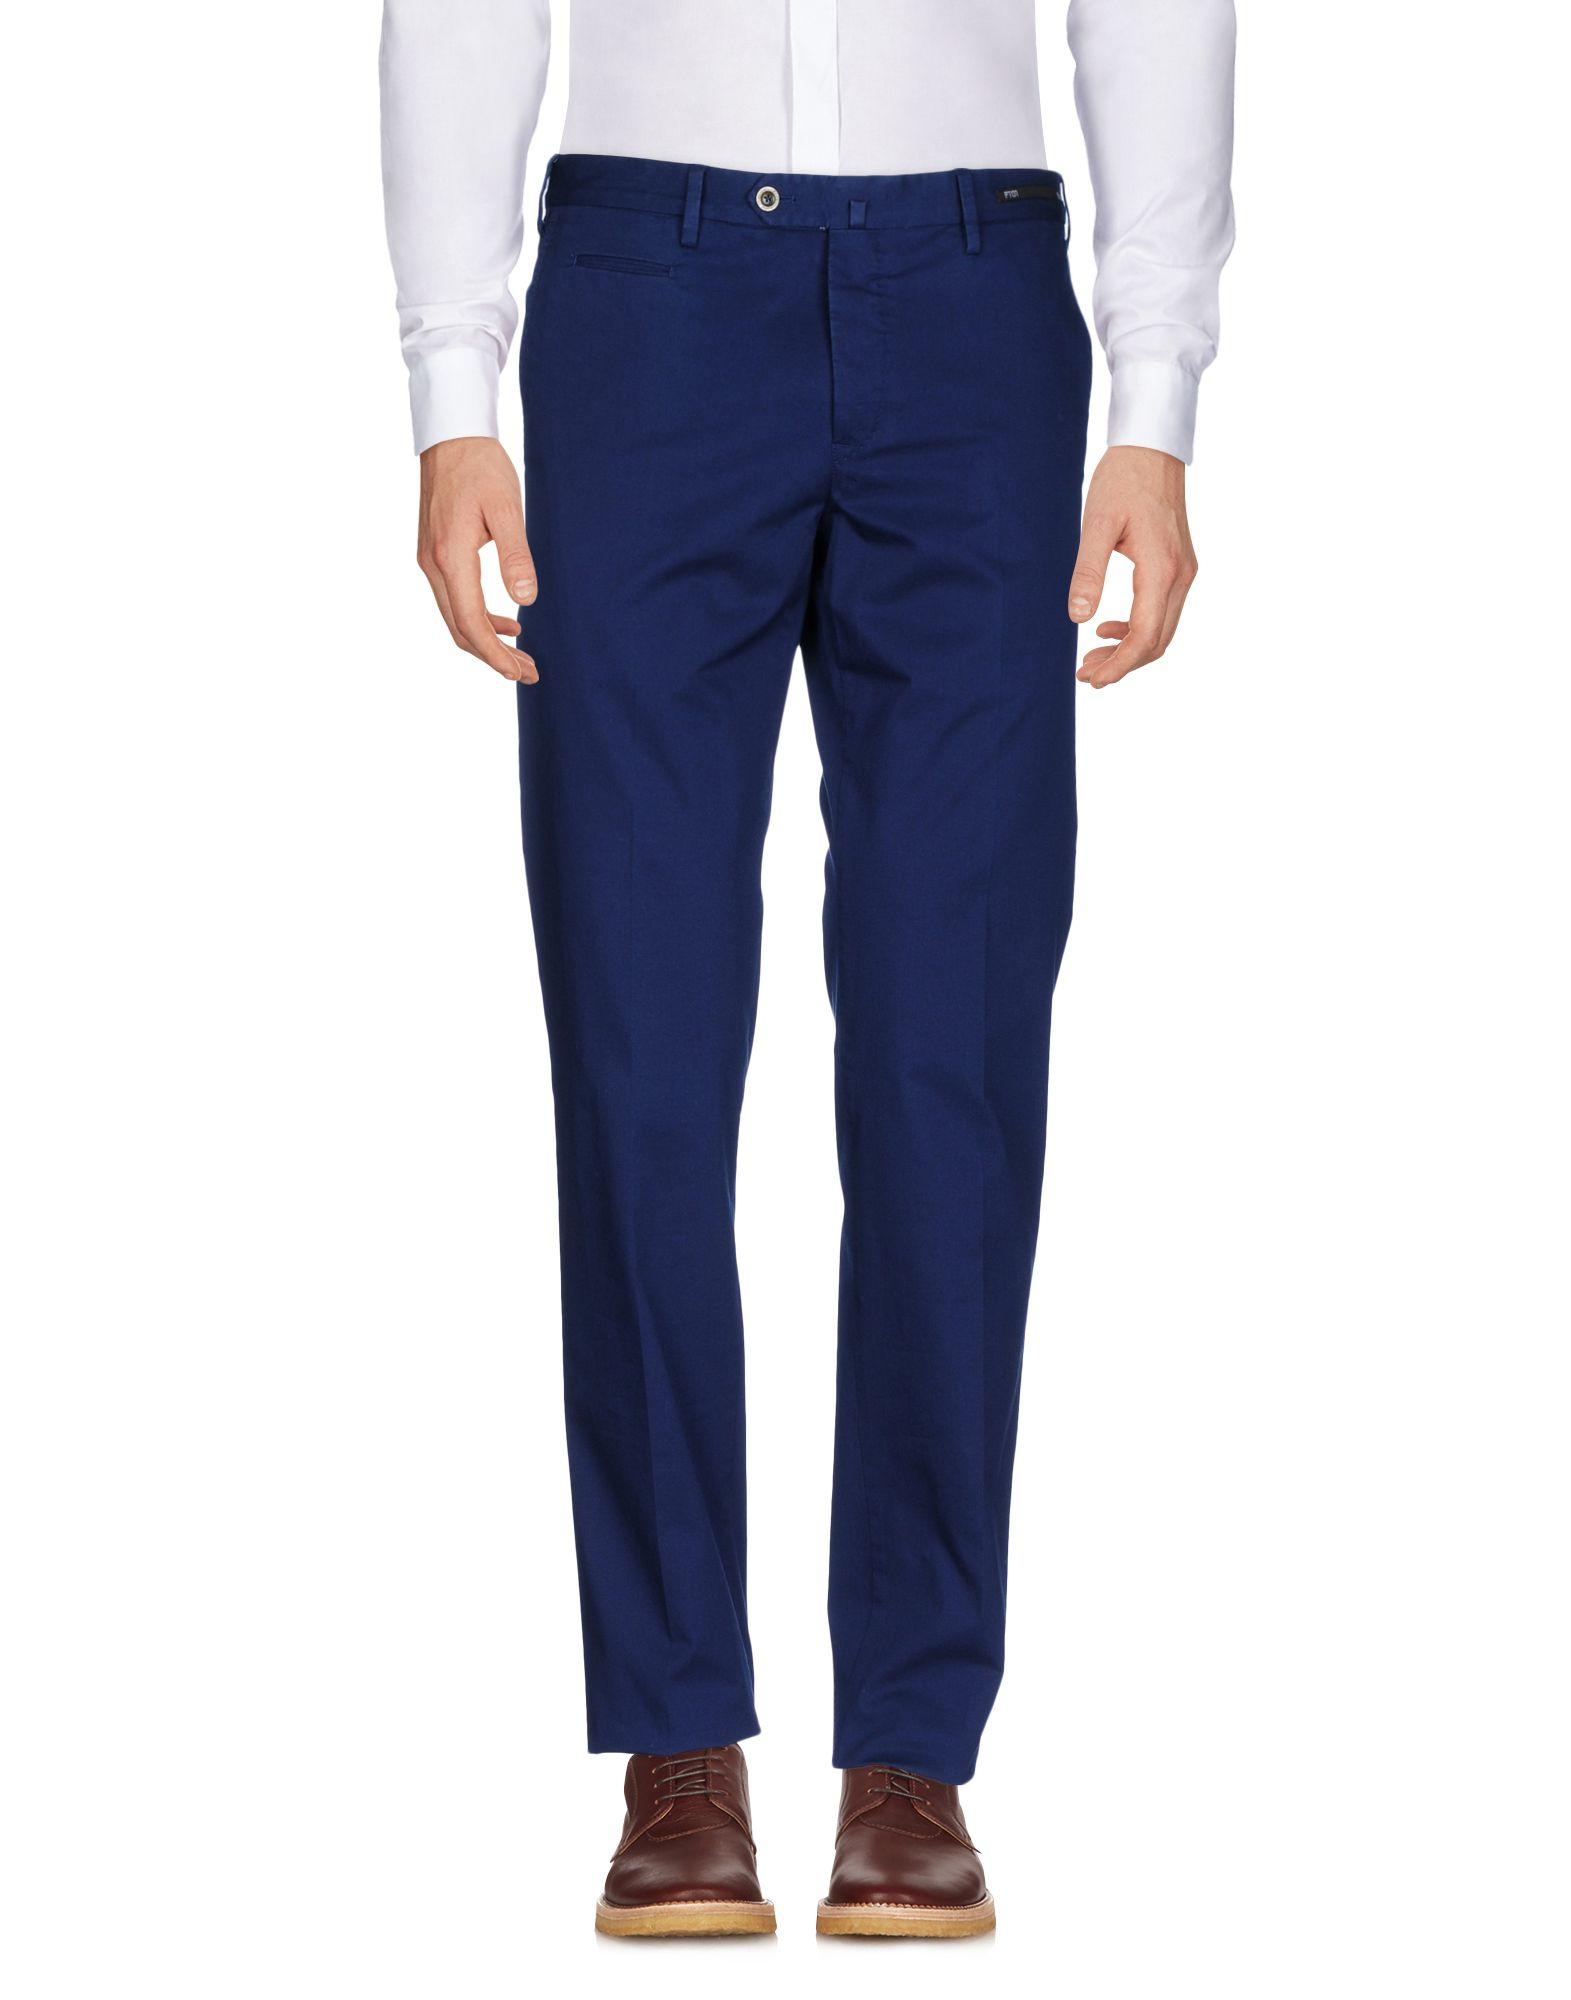 Pantalone Pt01 uomo - 13100748KV 13100748KV  Geschäft